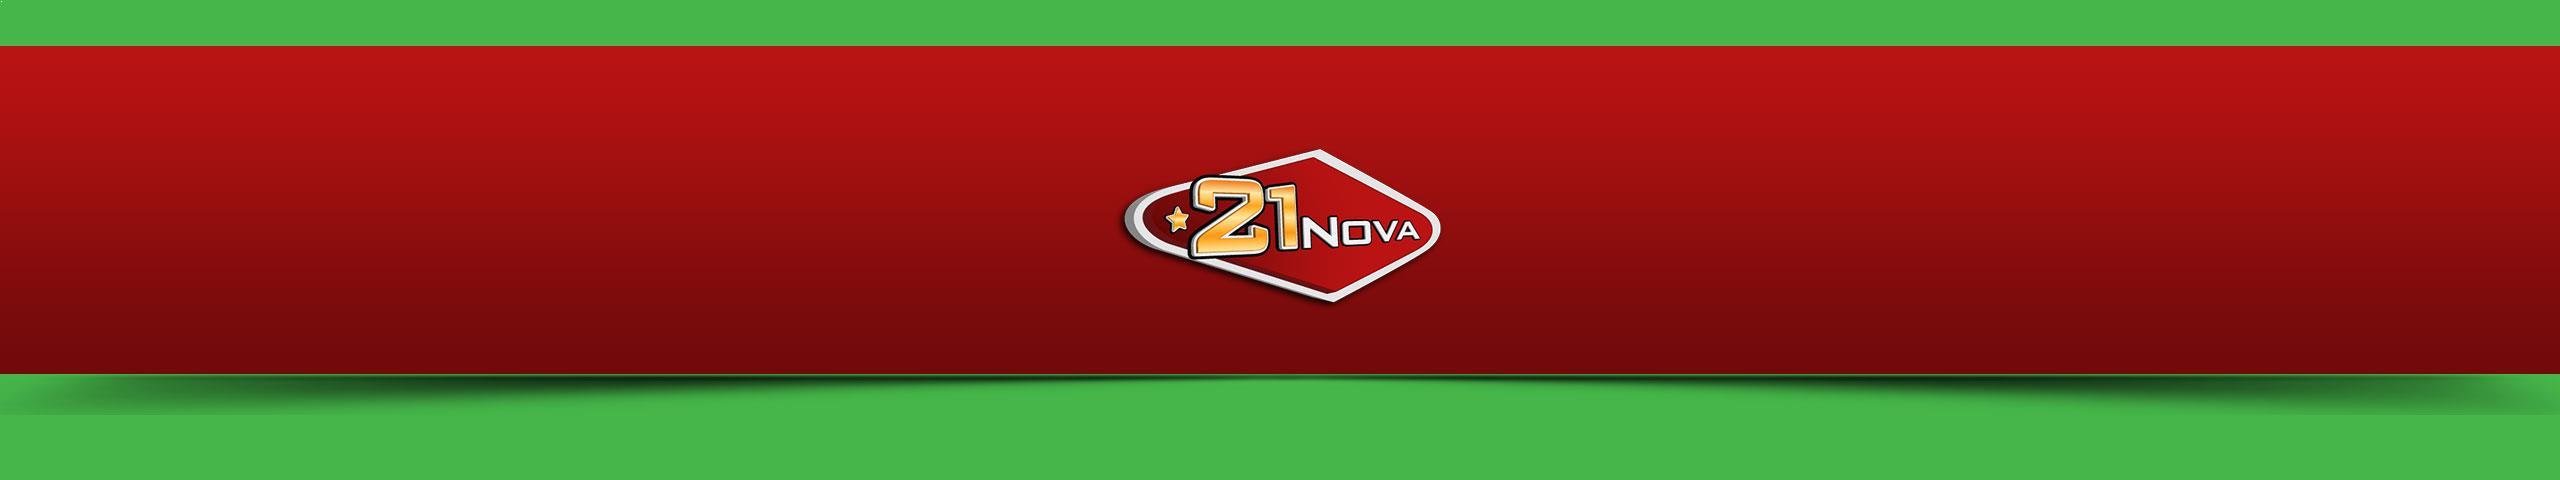 21Nova Casino Vizualizarea Casino-ului Multa Bafta Thumbnail